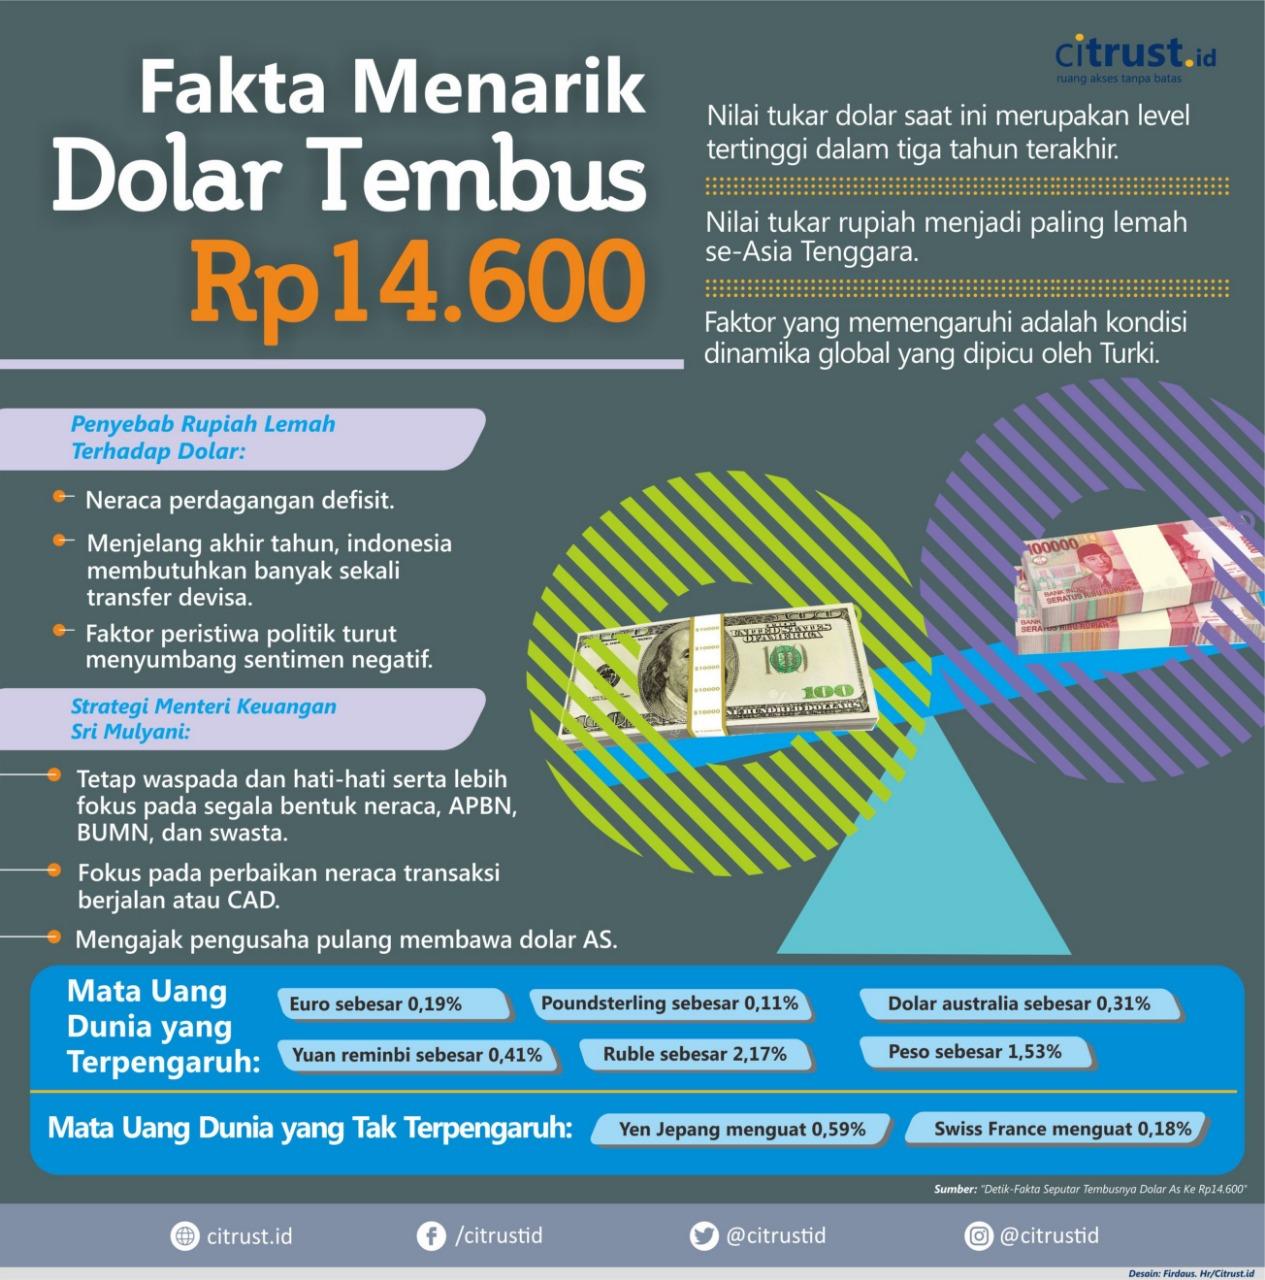 [INFOGRAFIK] Fakta Menarik Dolar Tembus Rp14.600